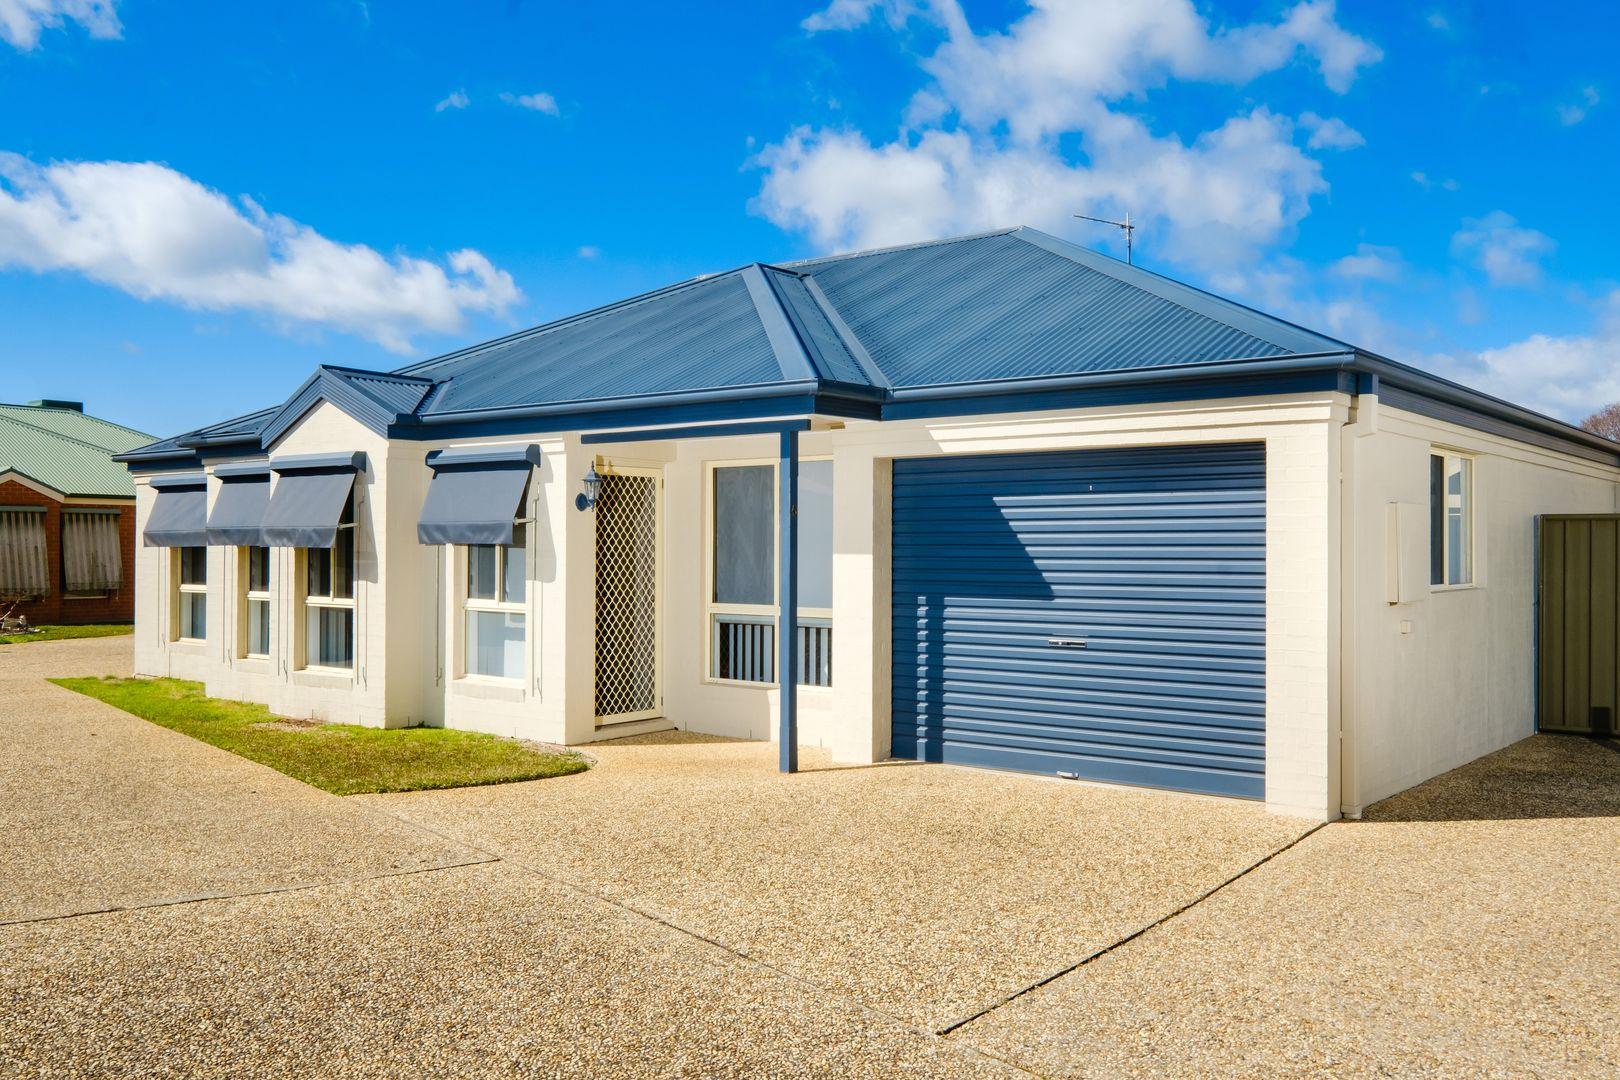 5/52 Mountford Crescent, East Albury NSW 2640, Image 0